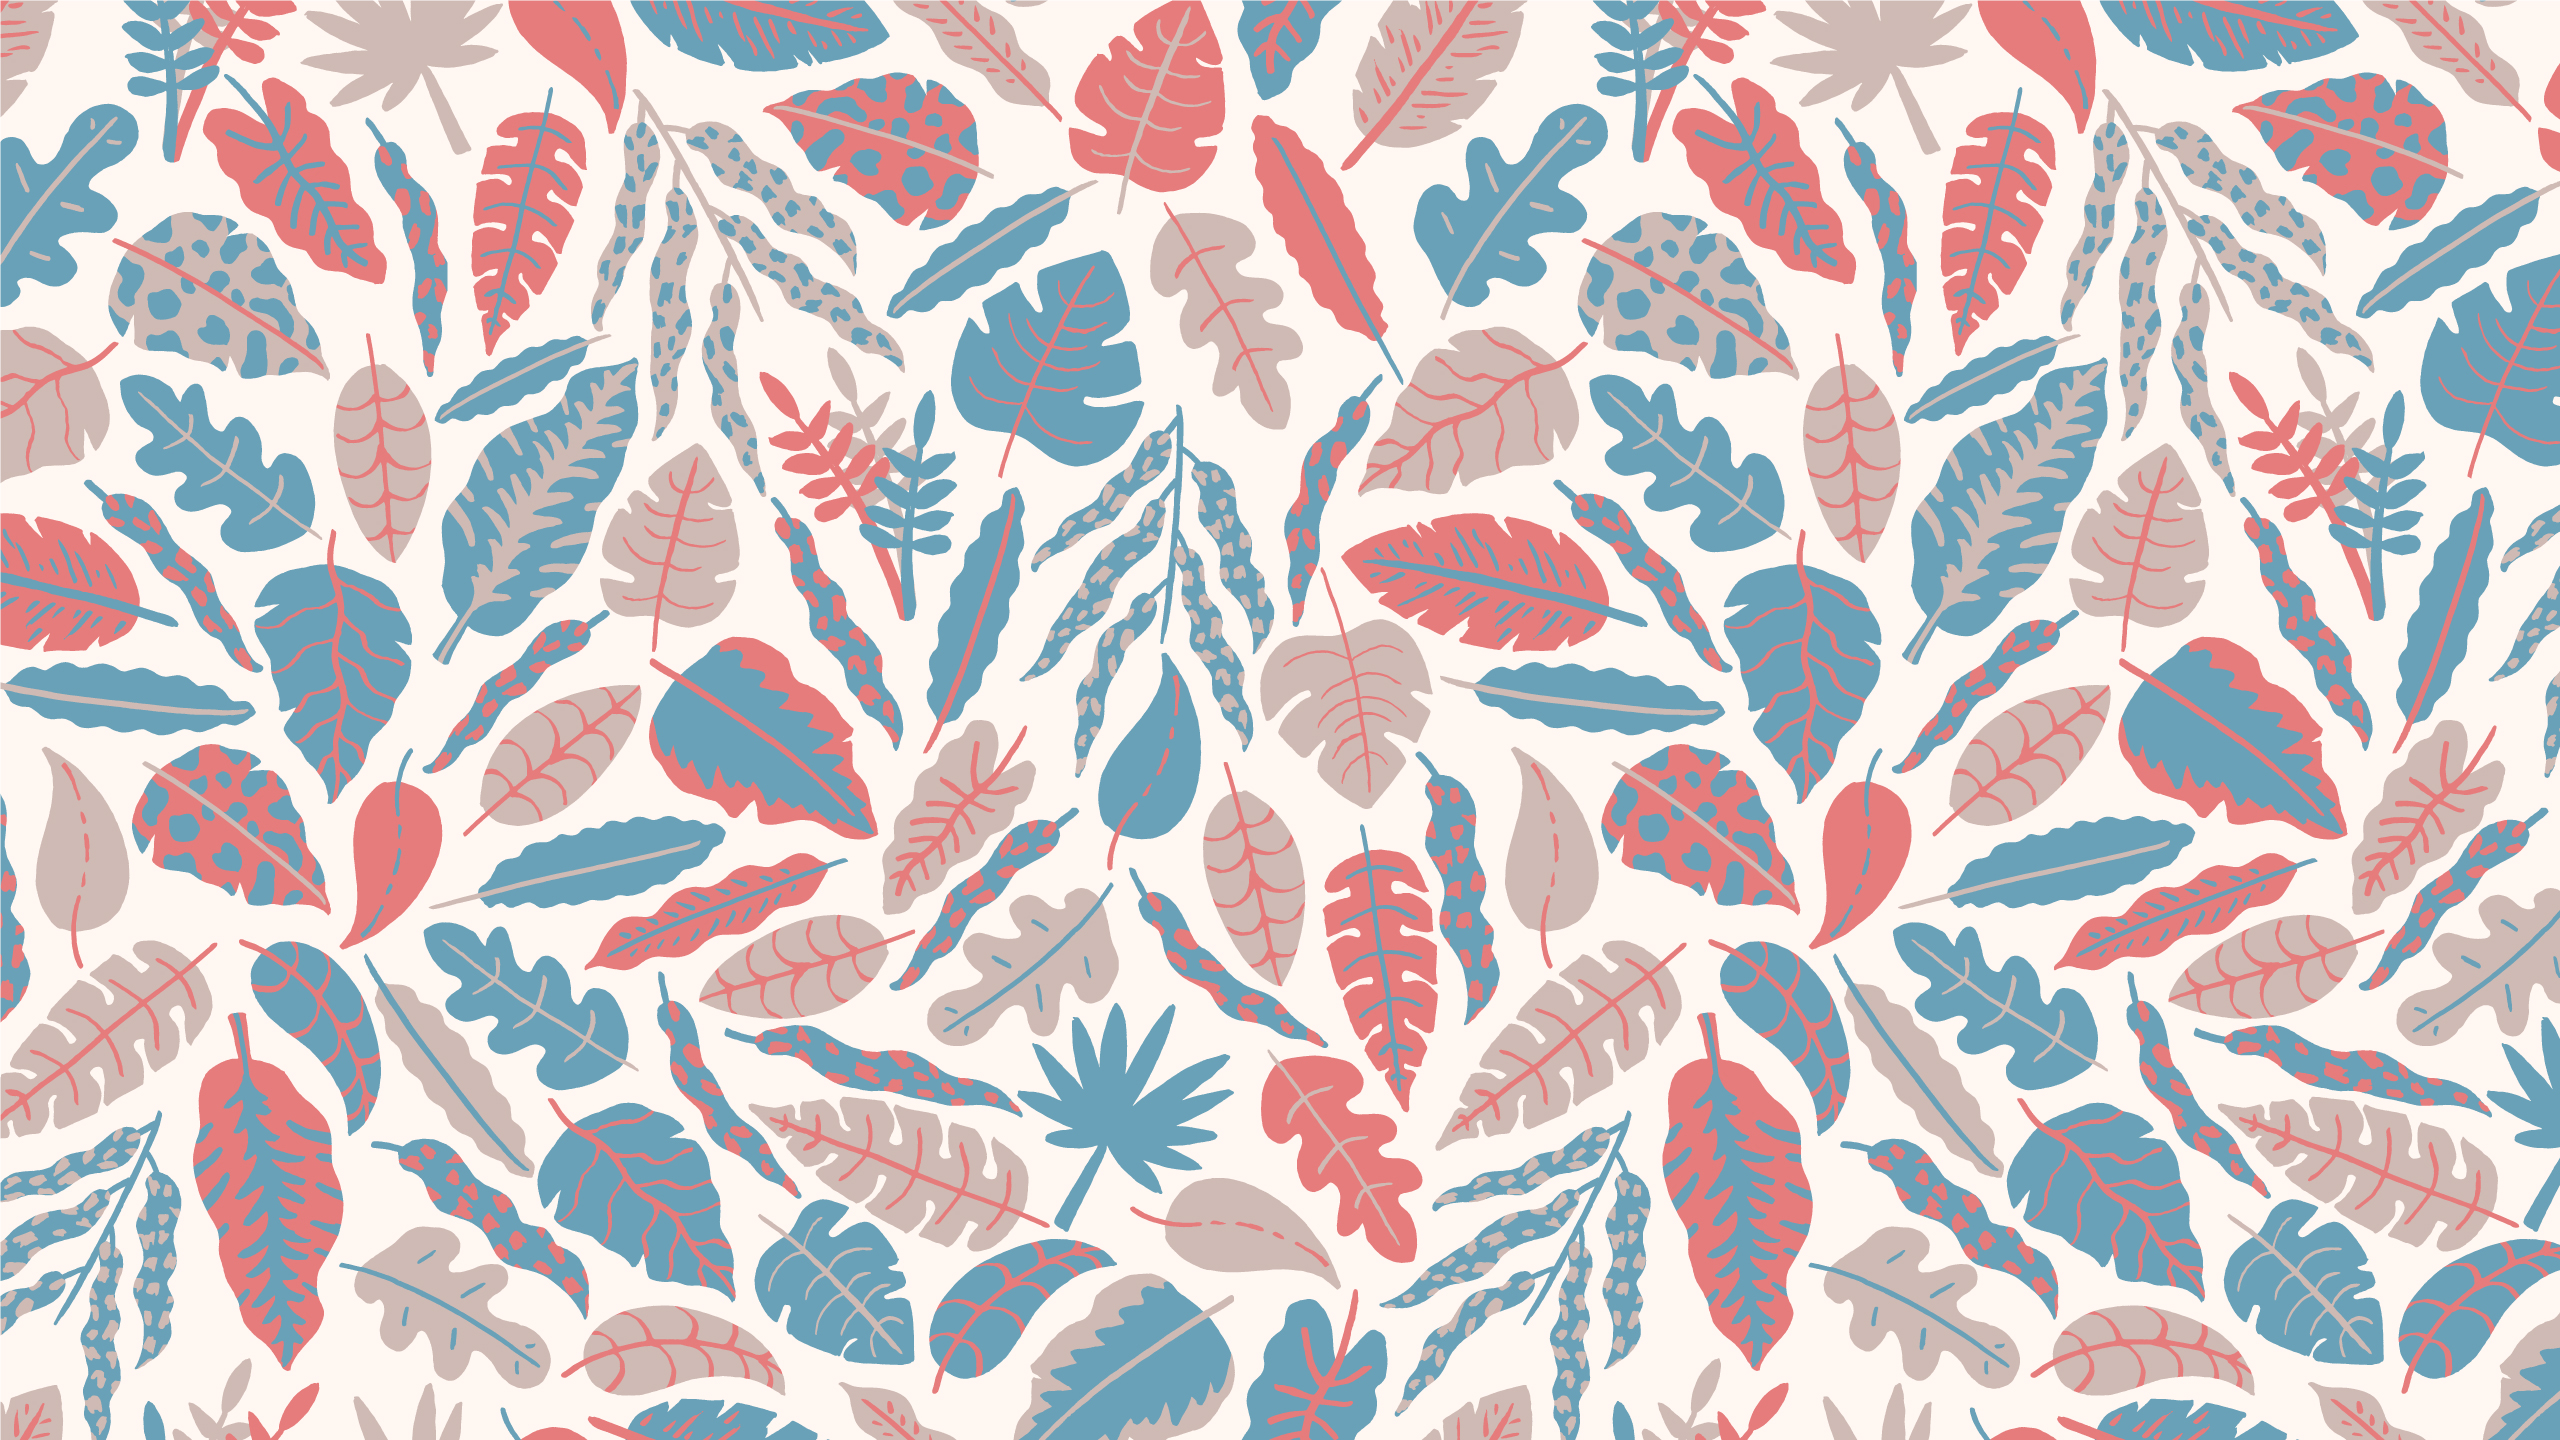 Indie Wallpapers Download 2560x1440